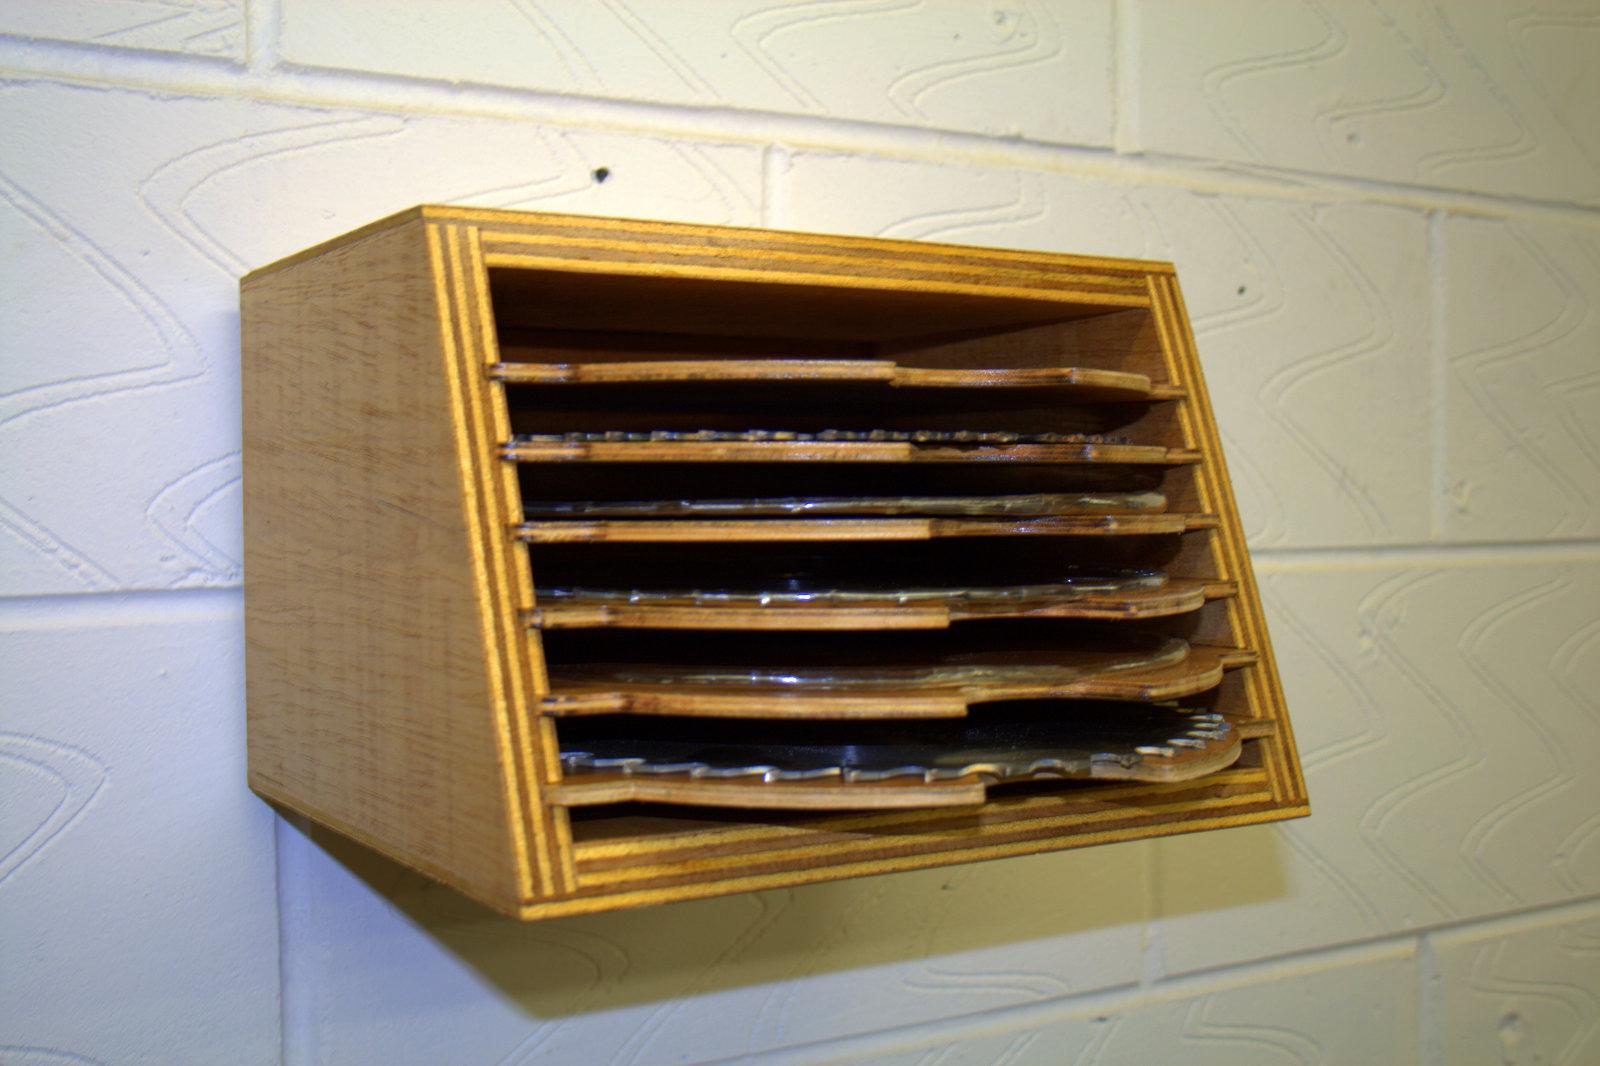 Tmc Woodworks Table Saw Blade Storage